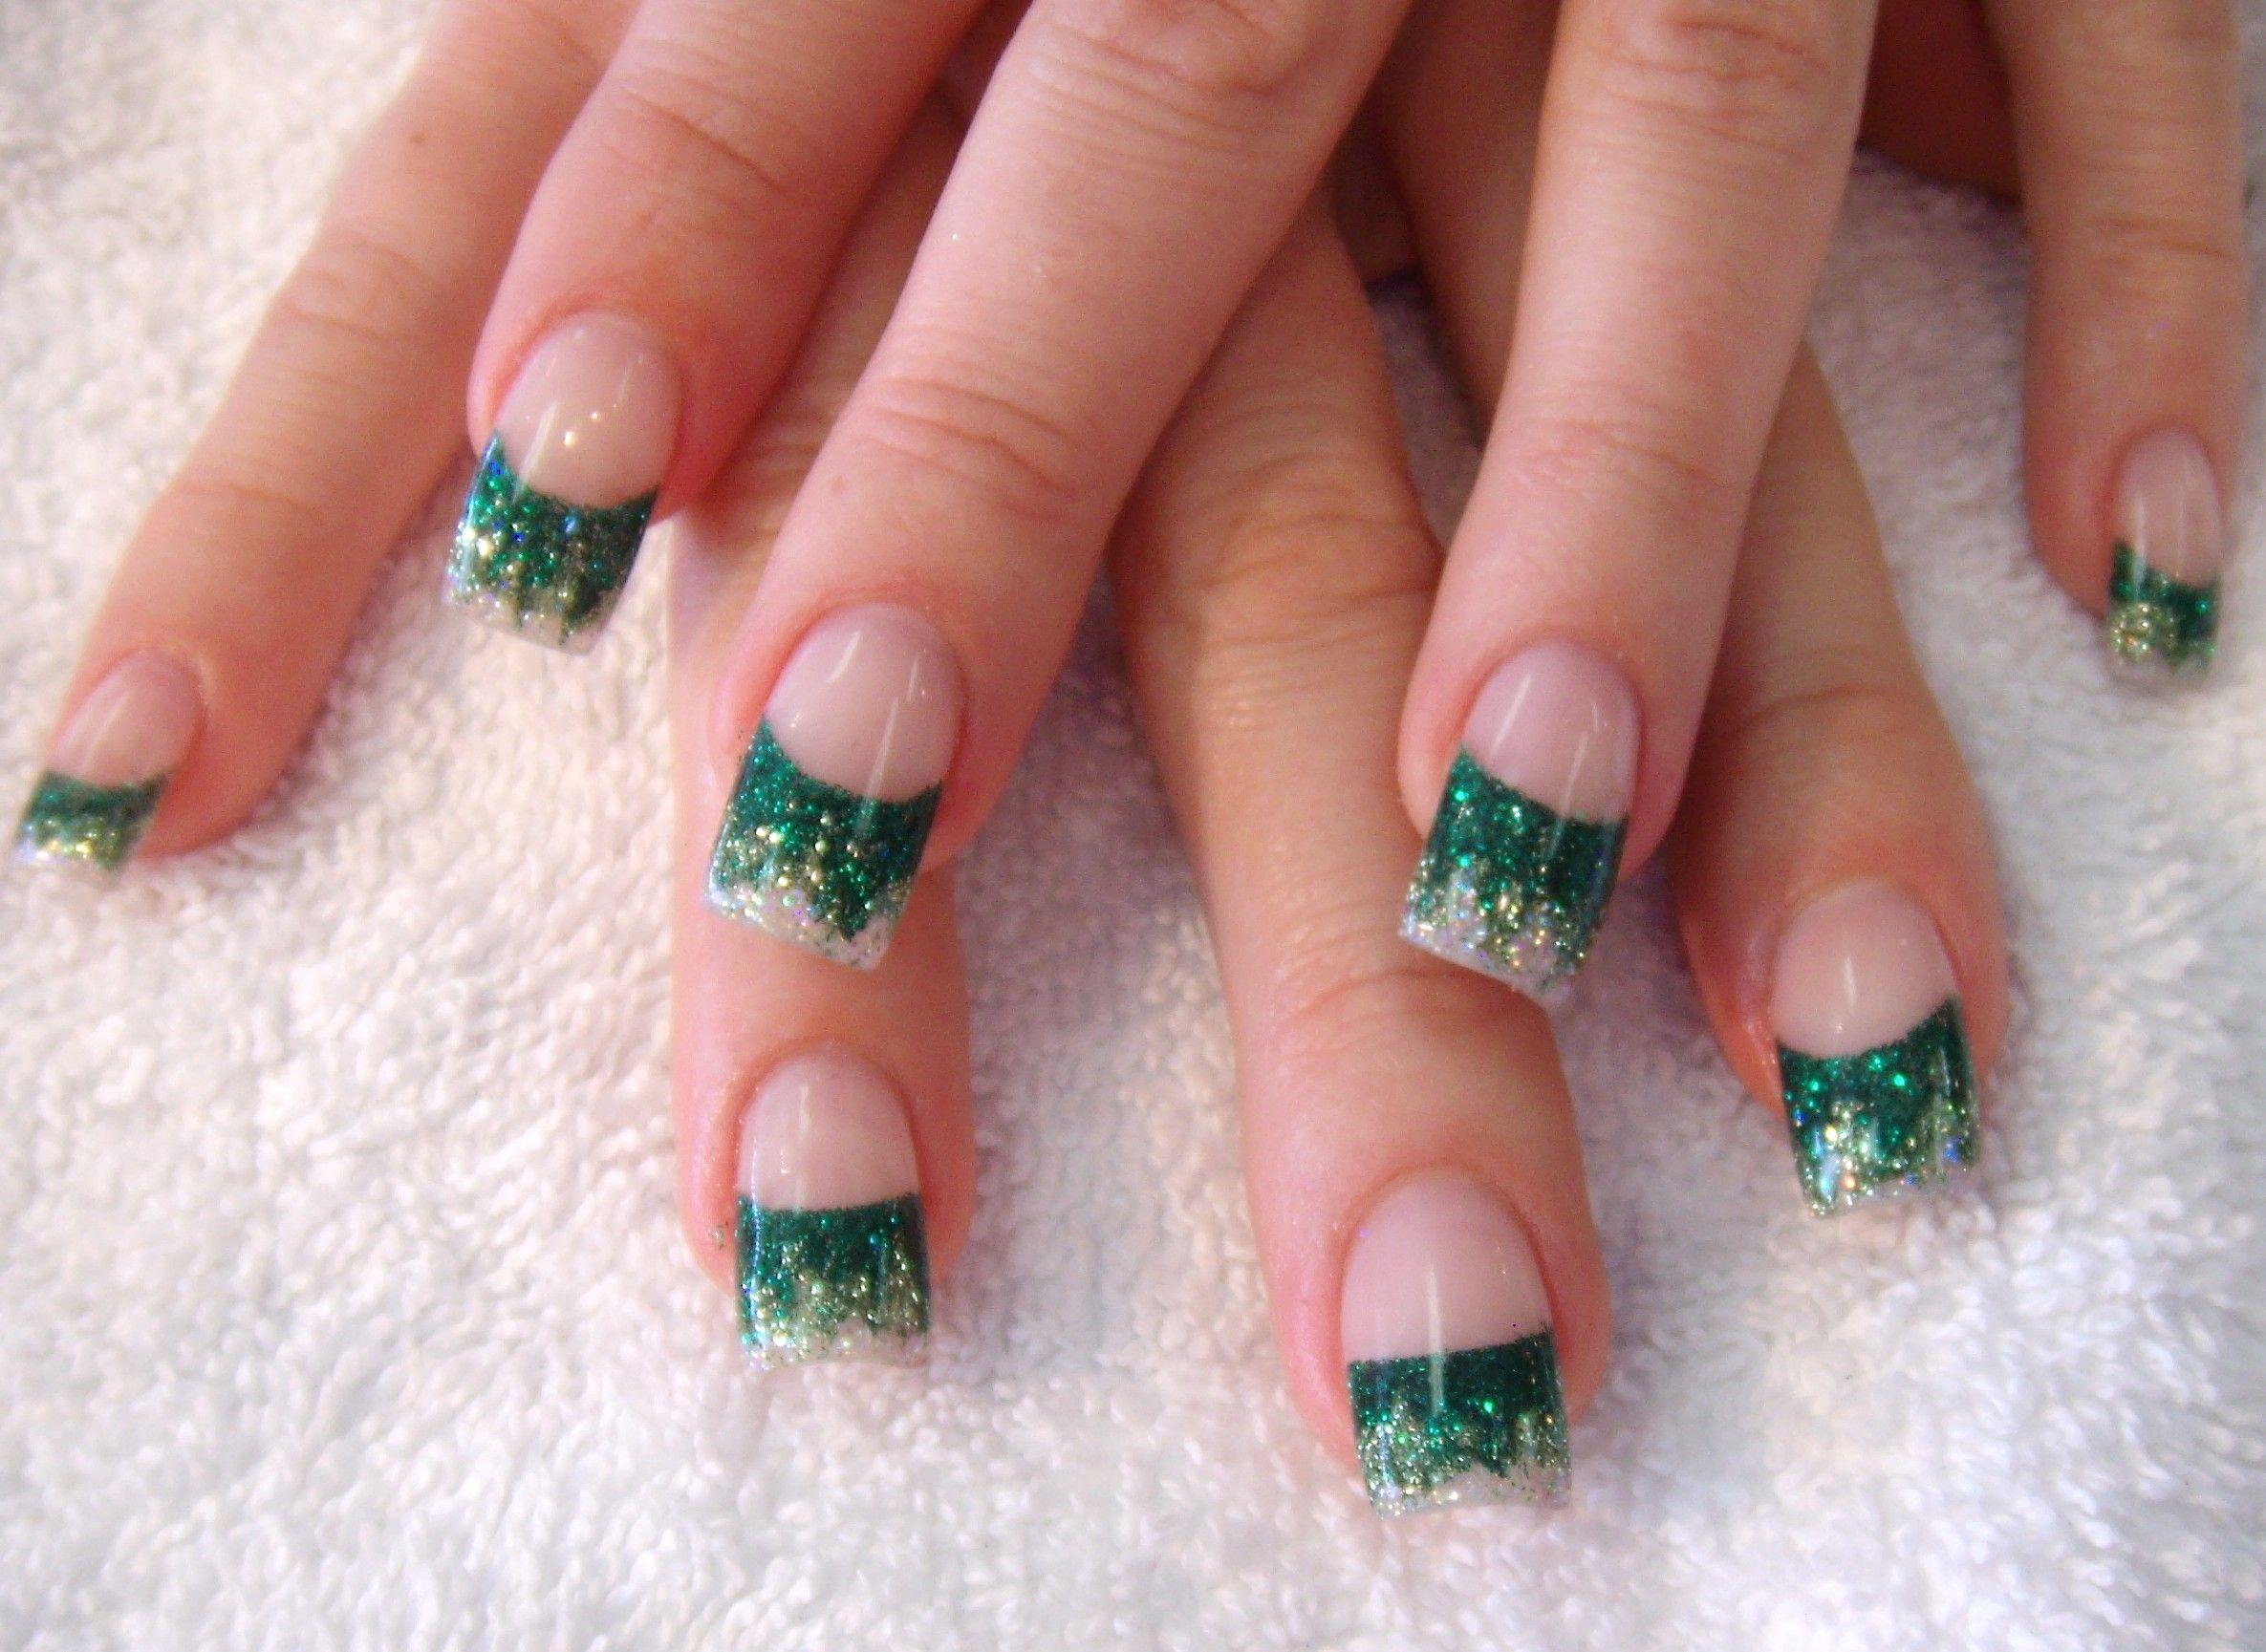 Elegant Nail Art Tips And Tricks | Nail art design gallery, Green ...